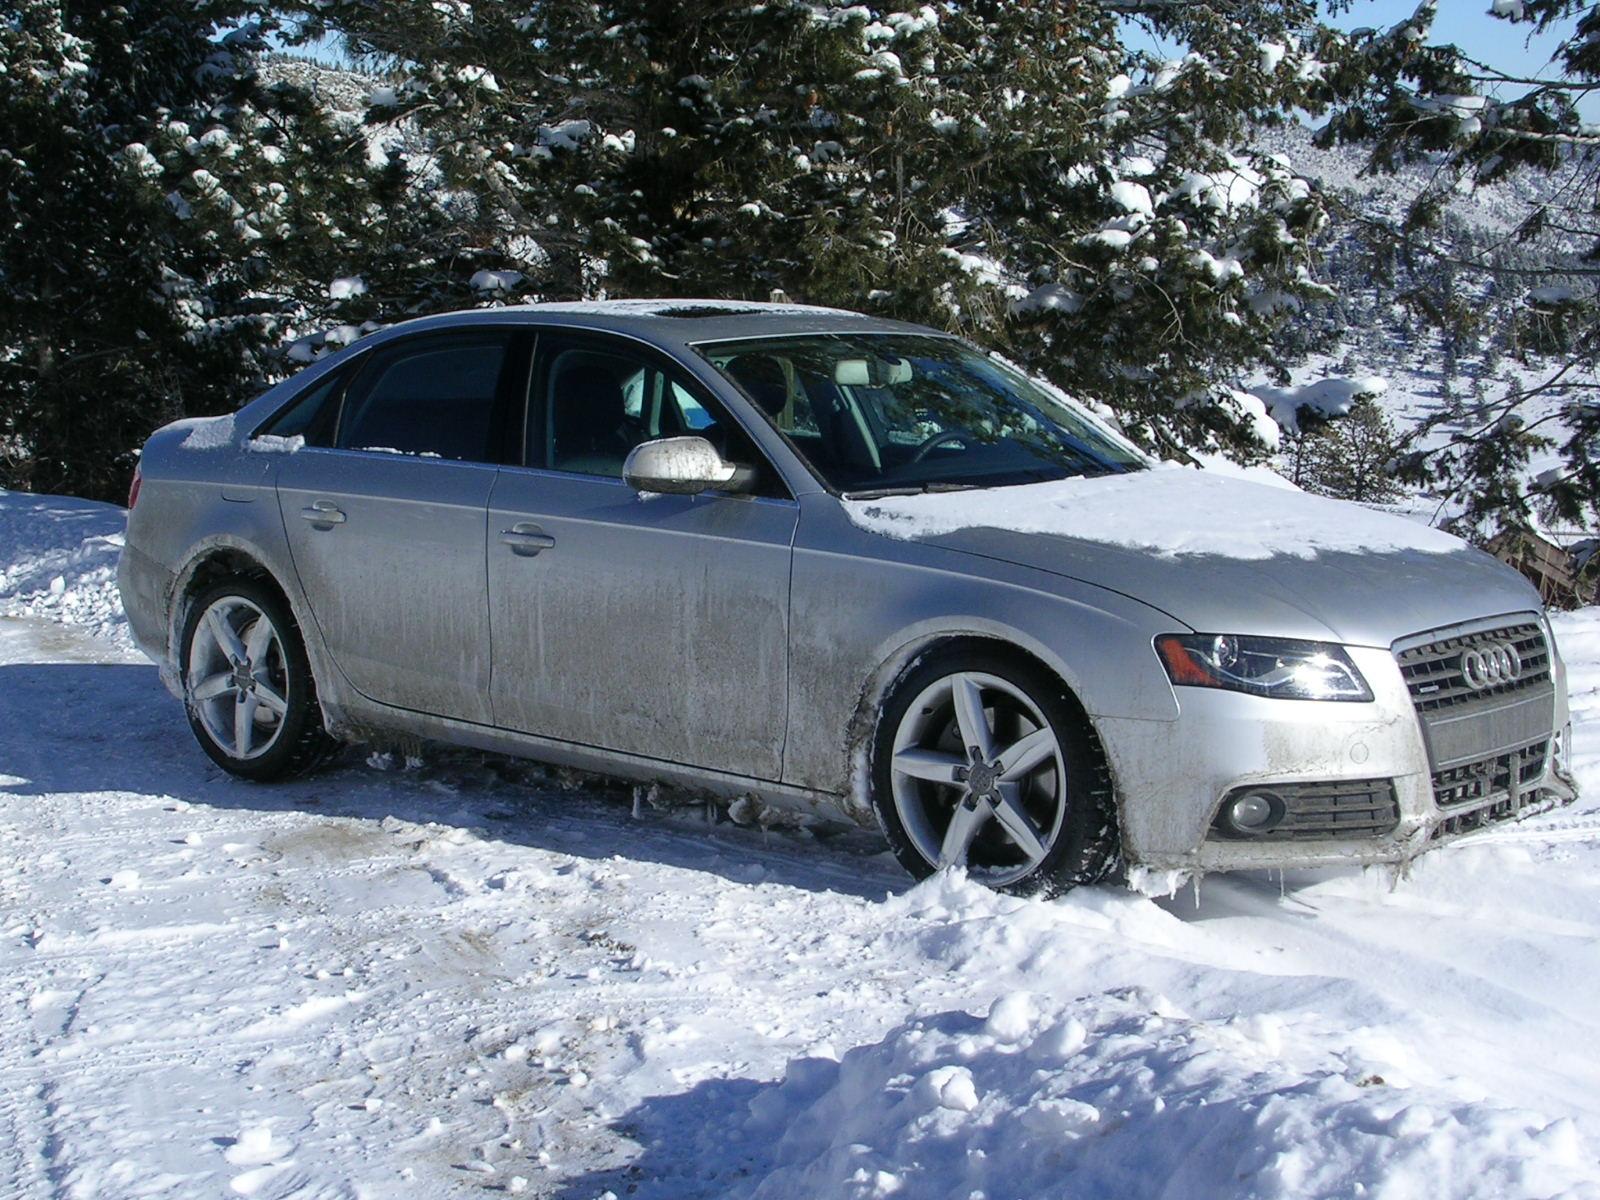 2010 Audi A4 Image 18